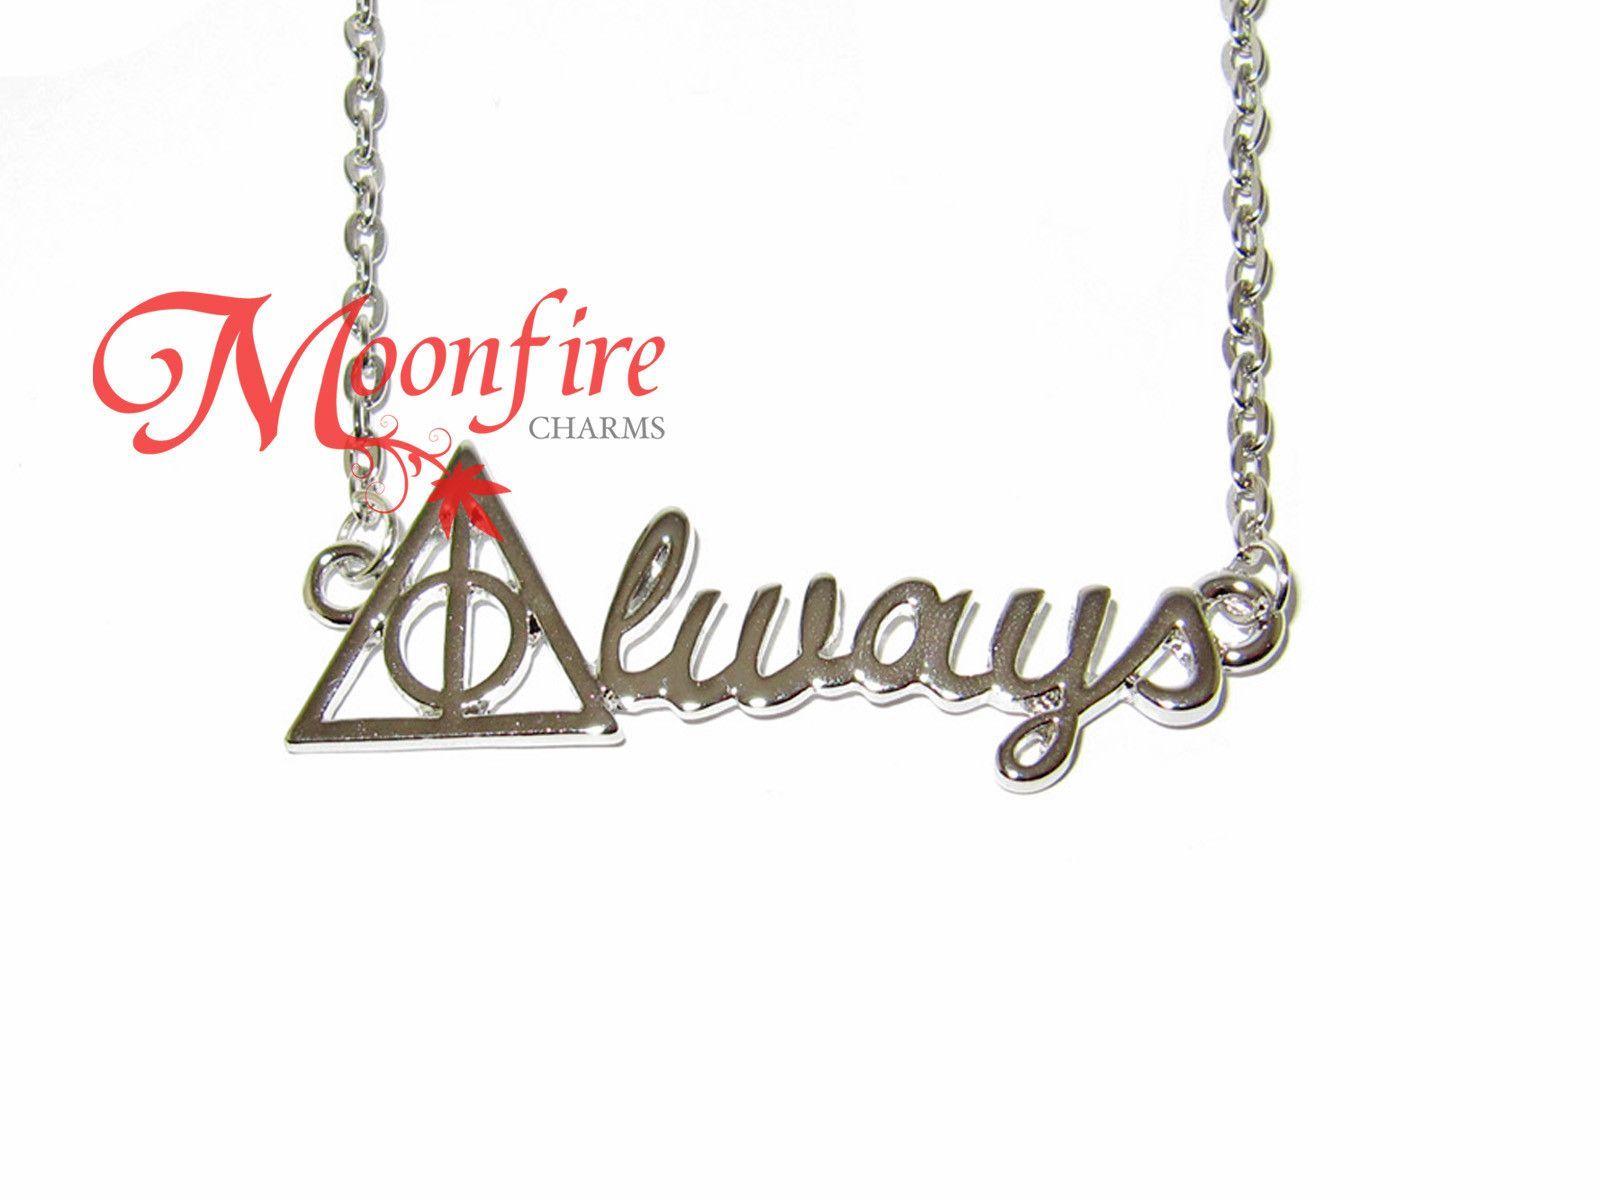 Wizarding world always deathly hallows symbol necklace wizarding world always deathly hallows symbol necklace buycottarizona